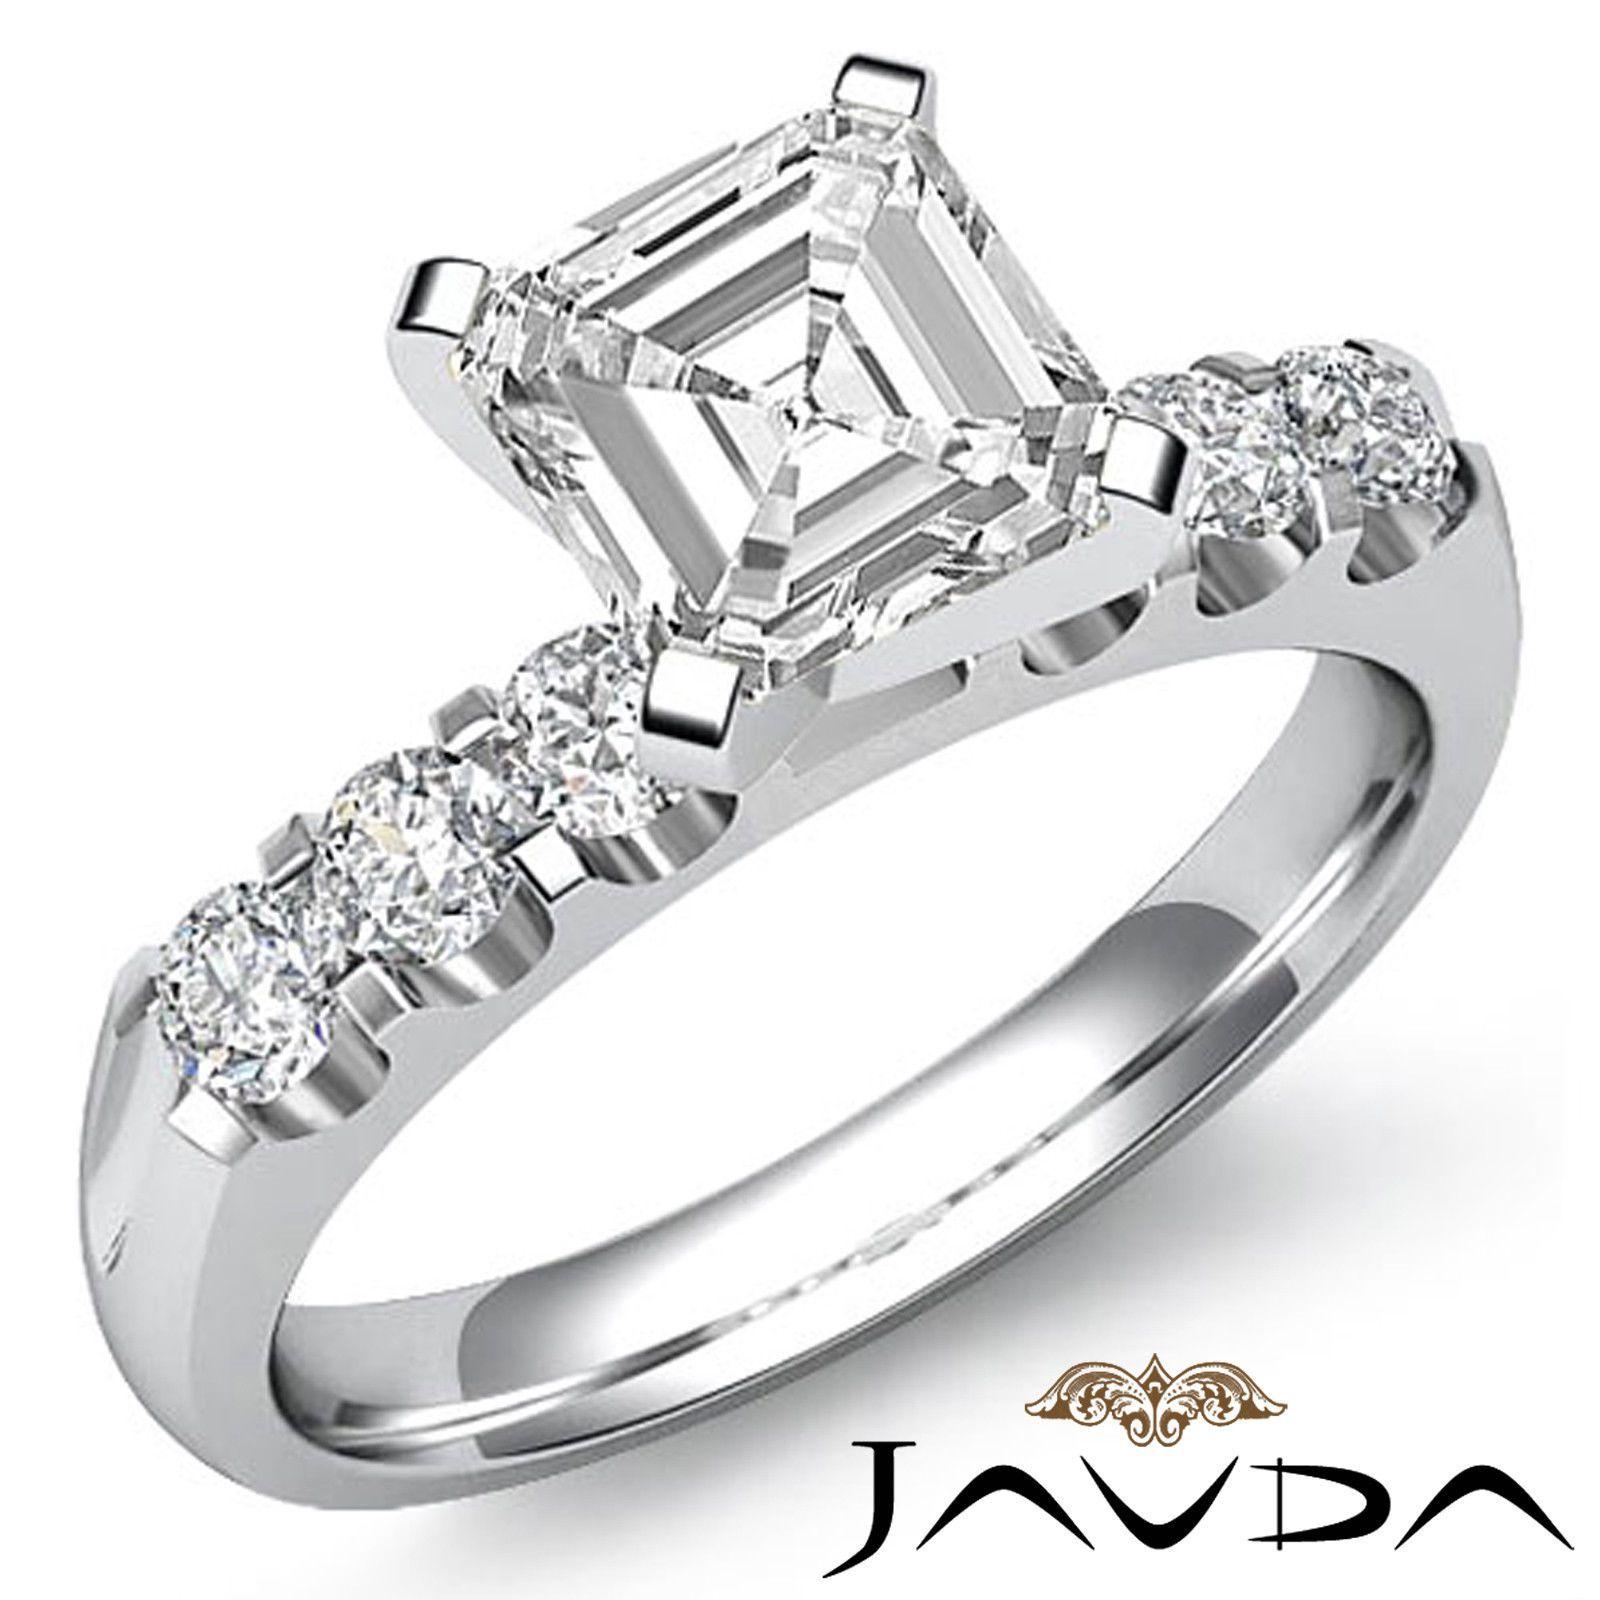 Brilliant Asscher Diamond Glistening Engagement Ring EGL E VS1 Platinum 1 31 Ct | eBay